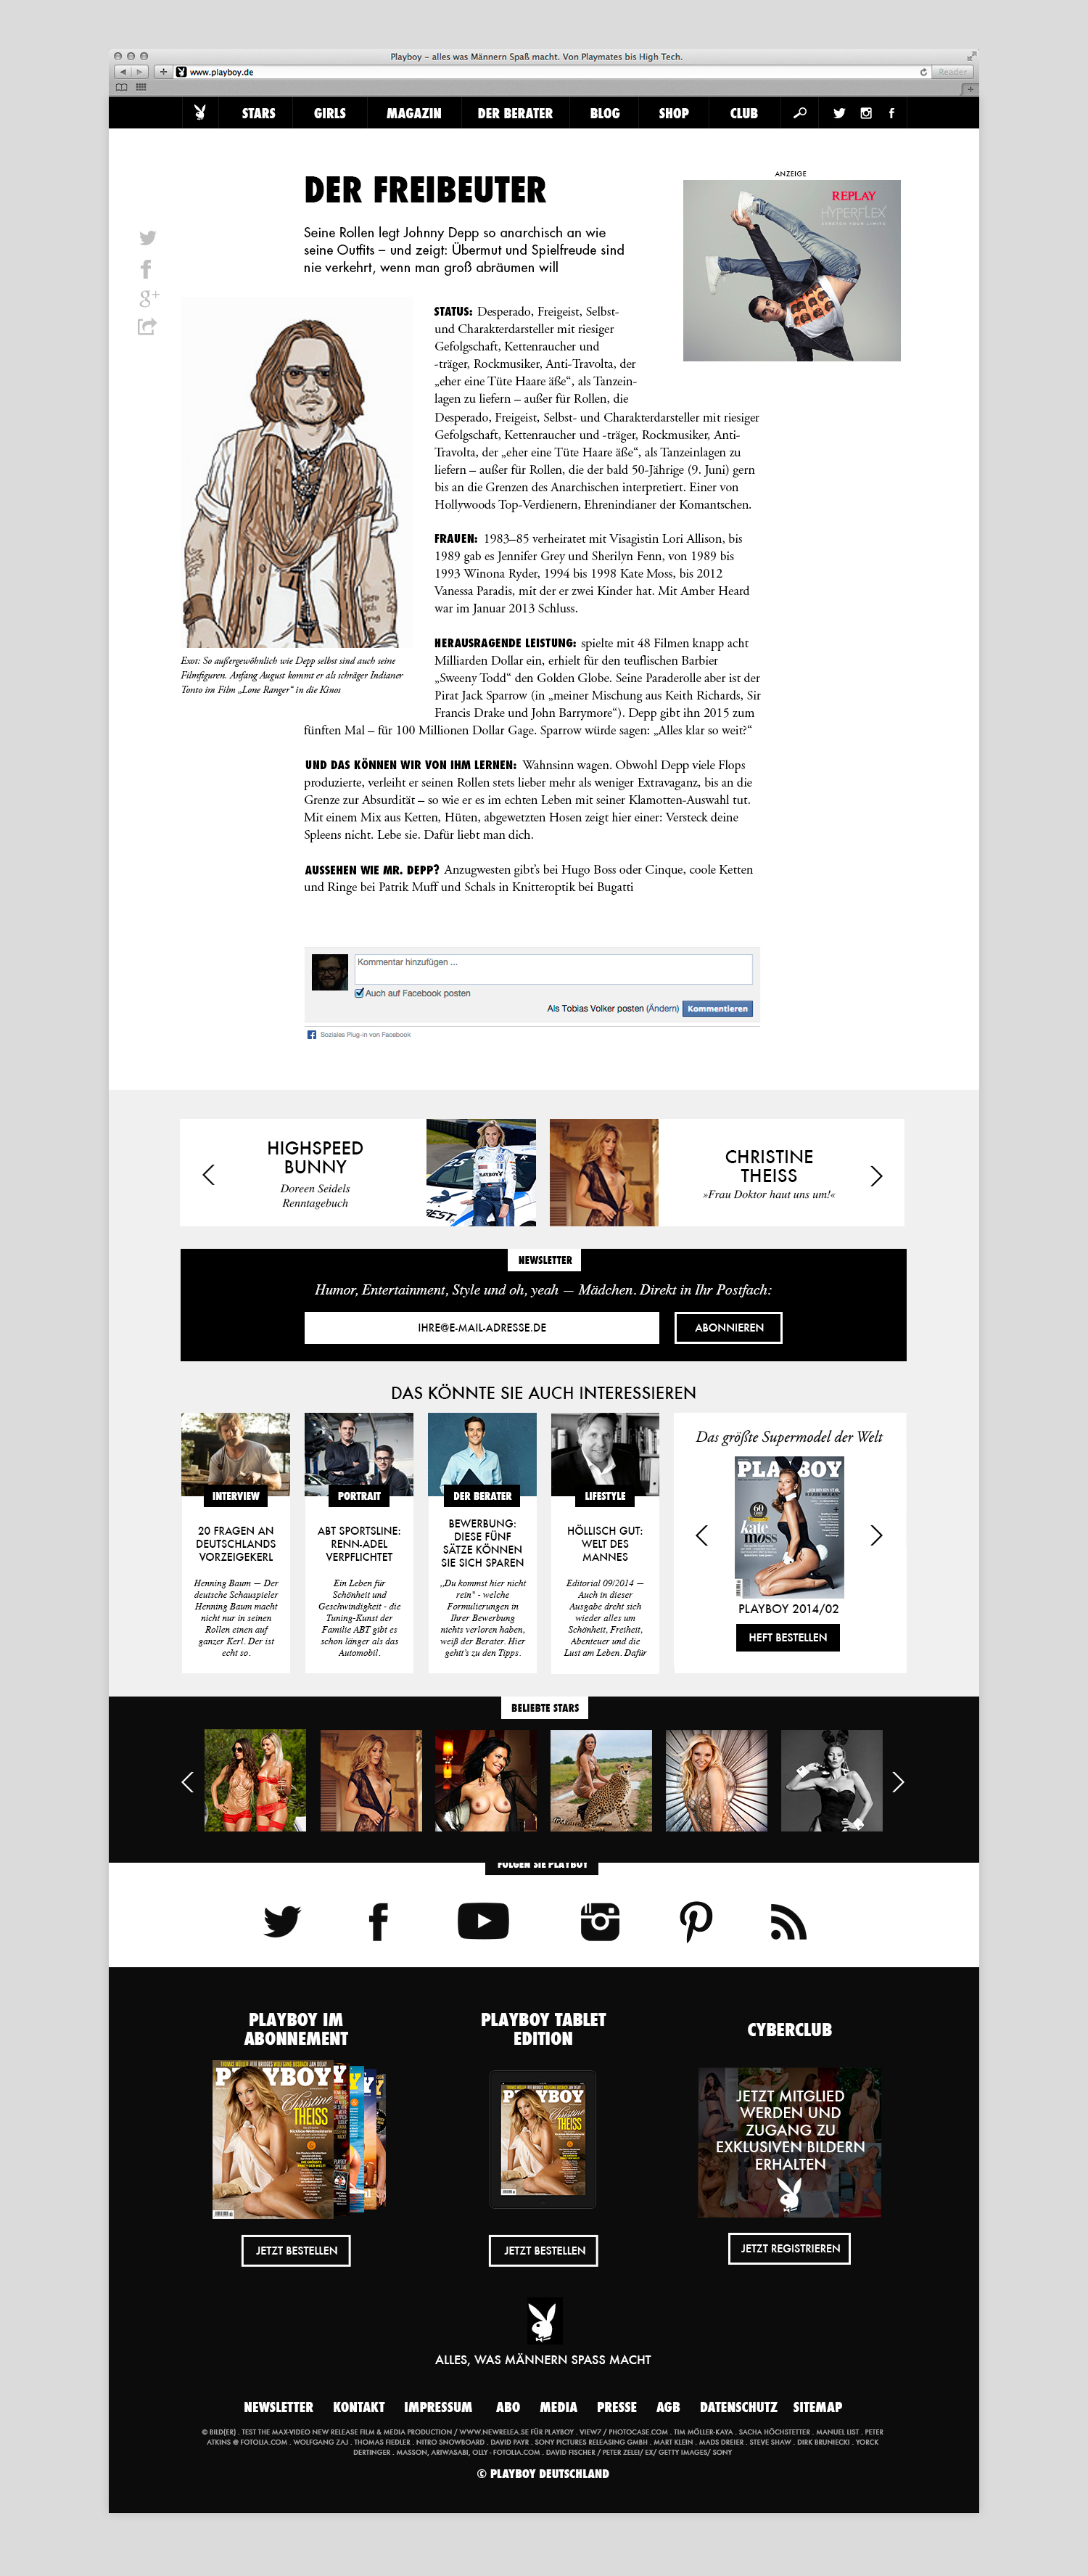 Playboy_Desktop_Artikel_kurz_Portfolio_Schatten2